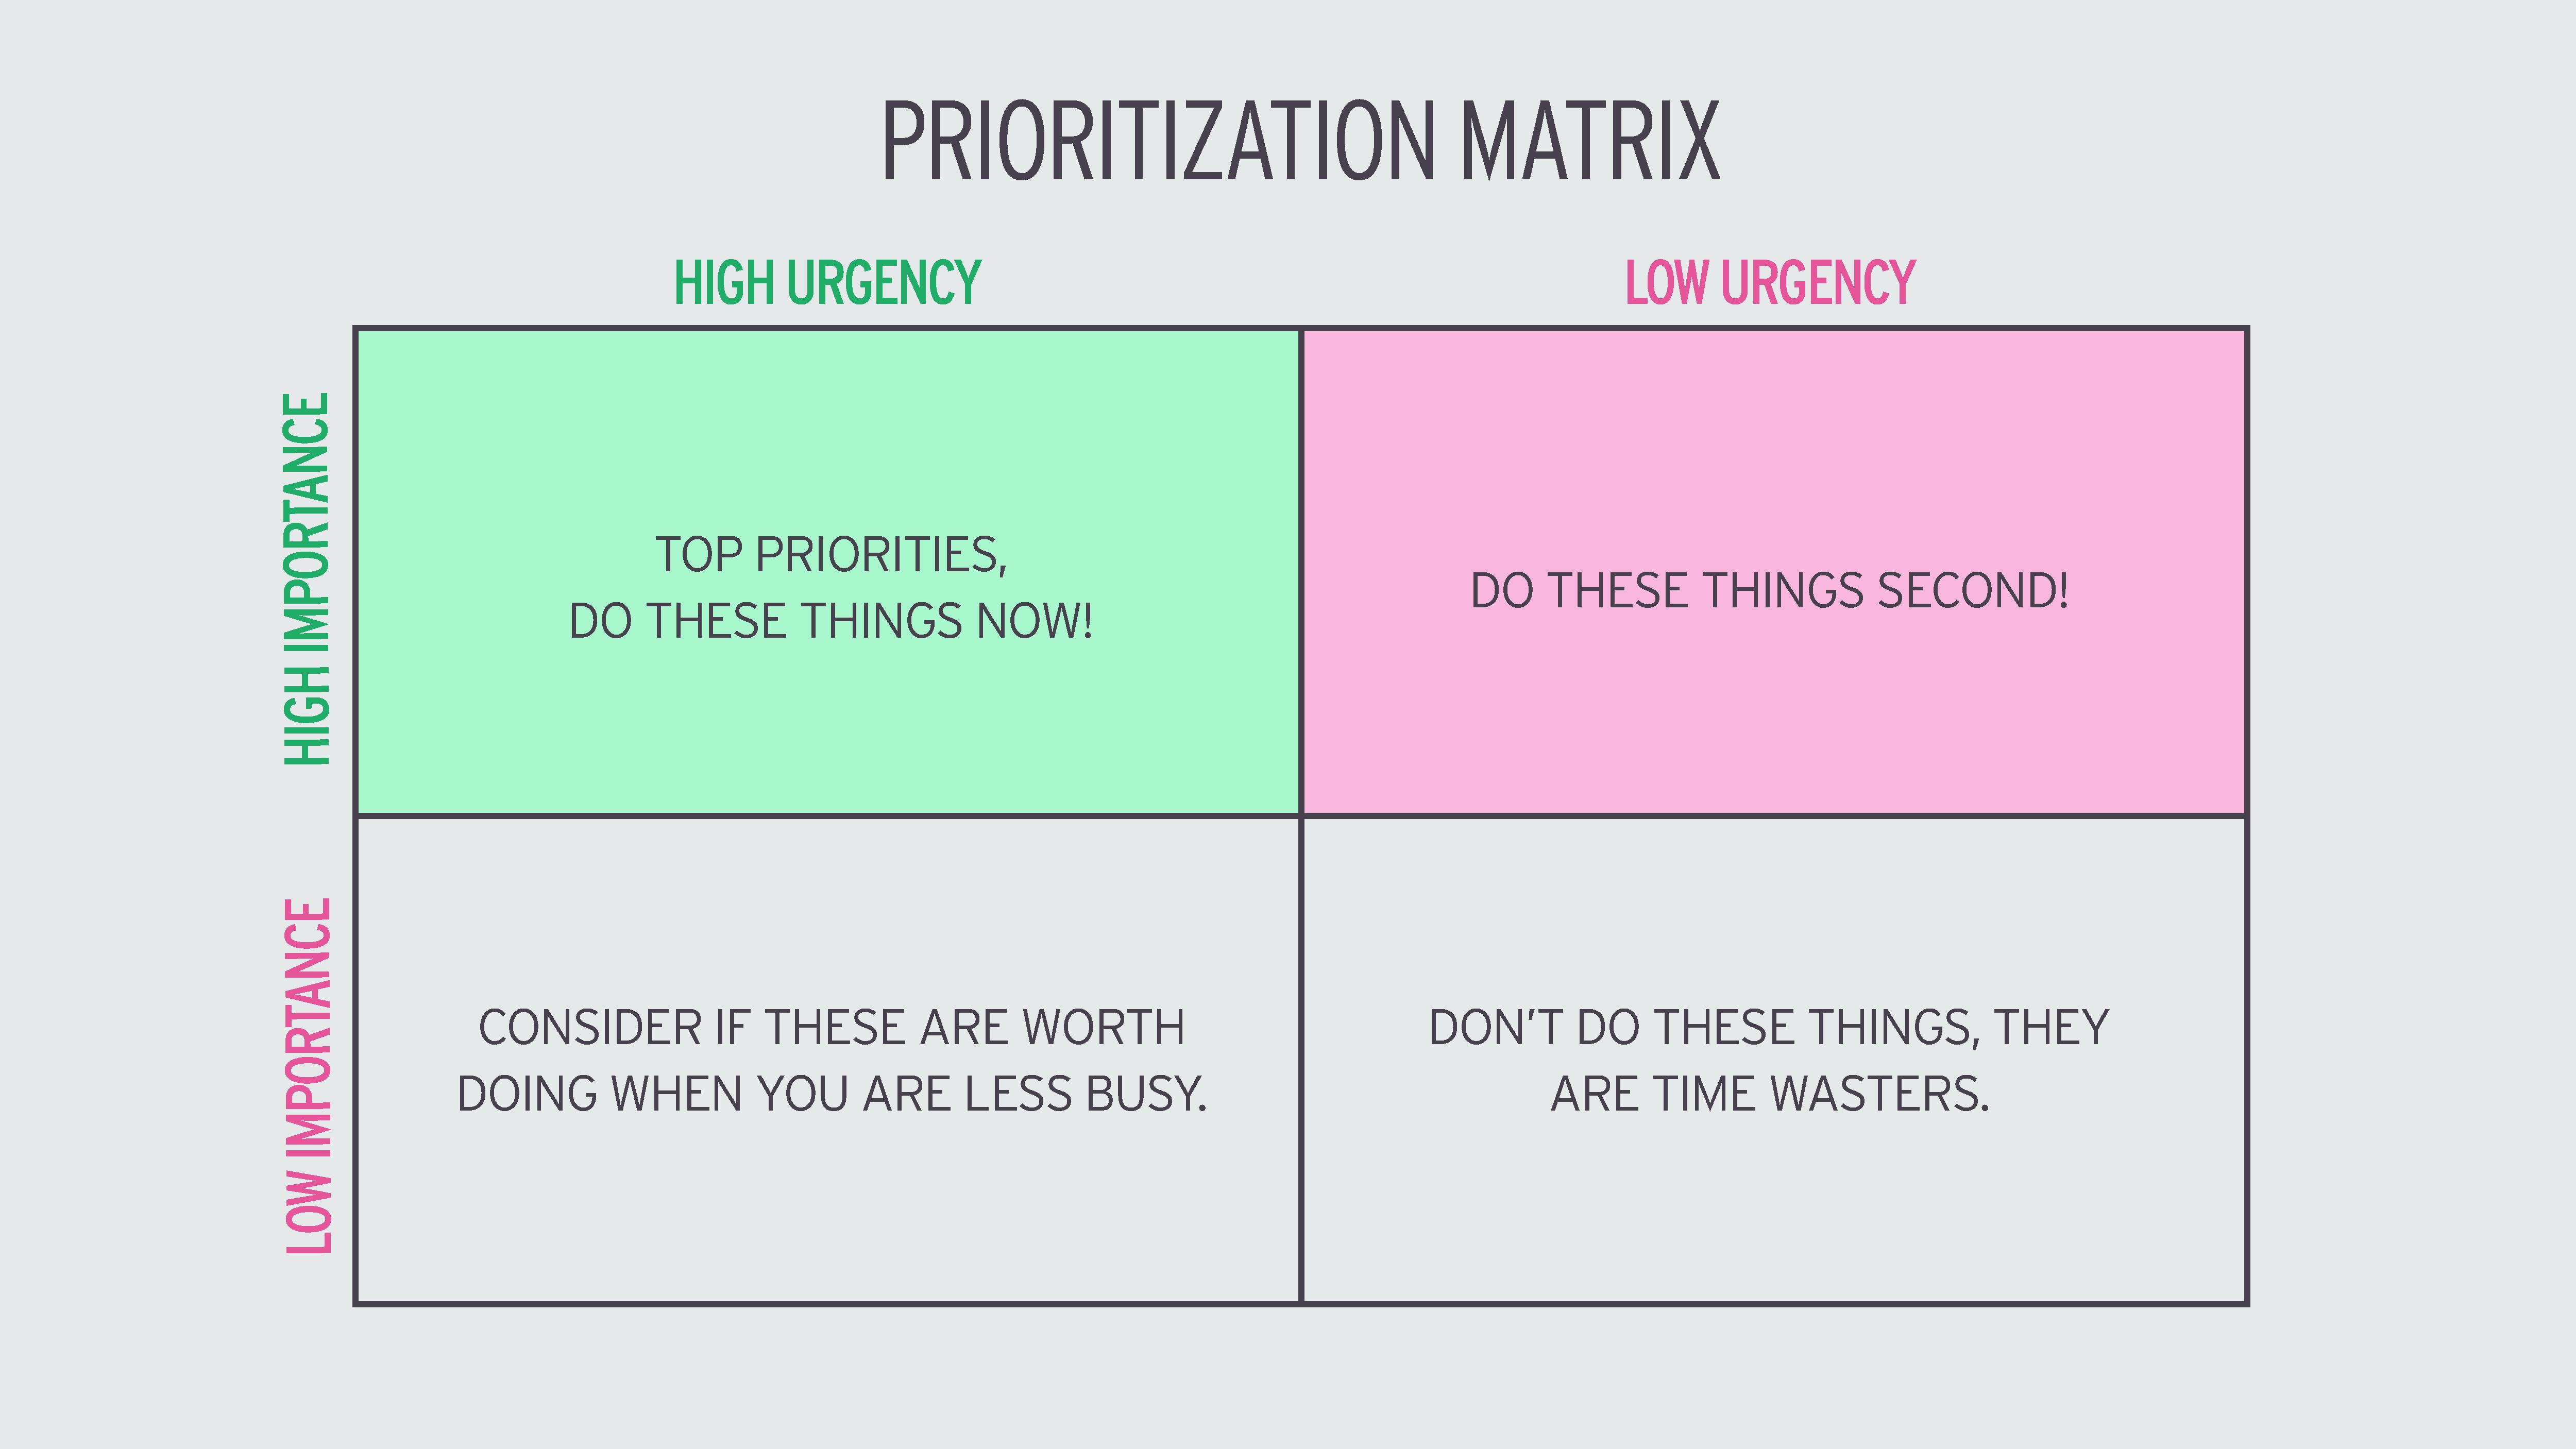 File:4308-prioritizationmatrix.png